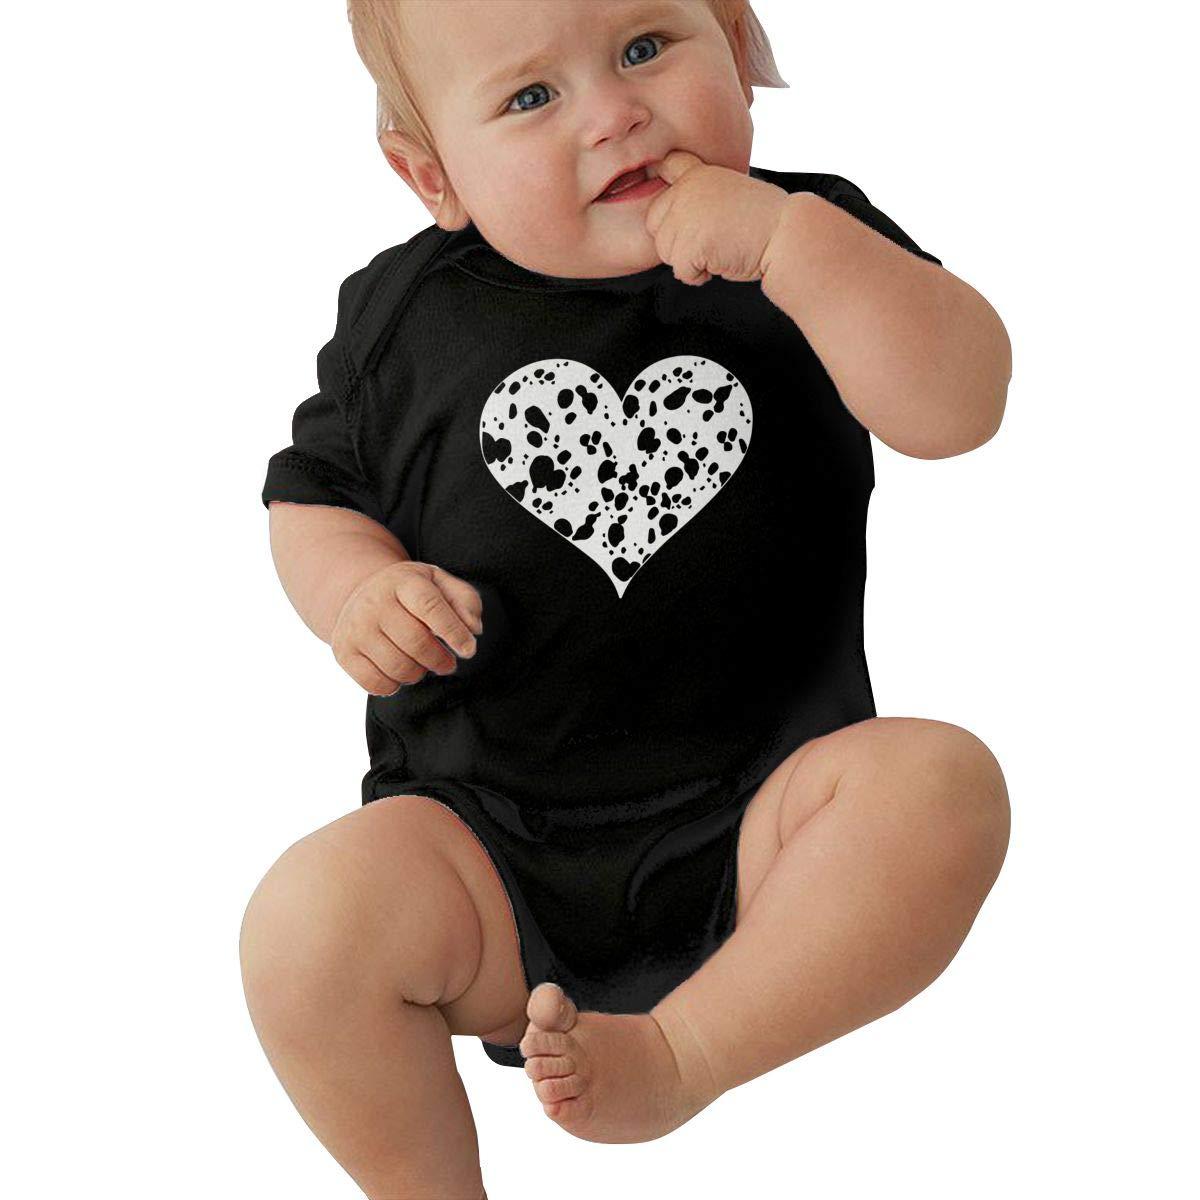 Mri-le2 Baby Boy Short Sleeve Bodysuit Dalmatian Heart Toddler Jumpsuit